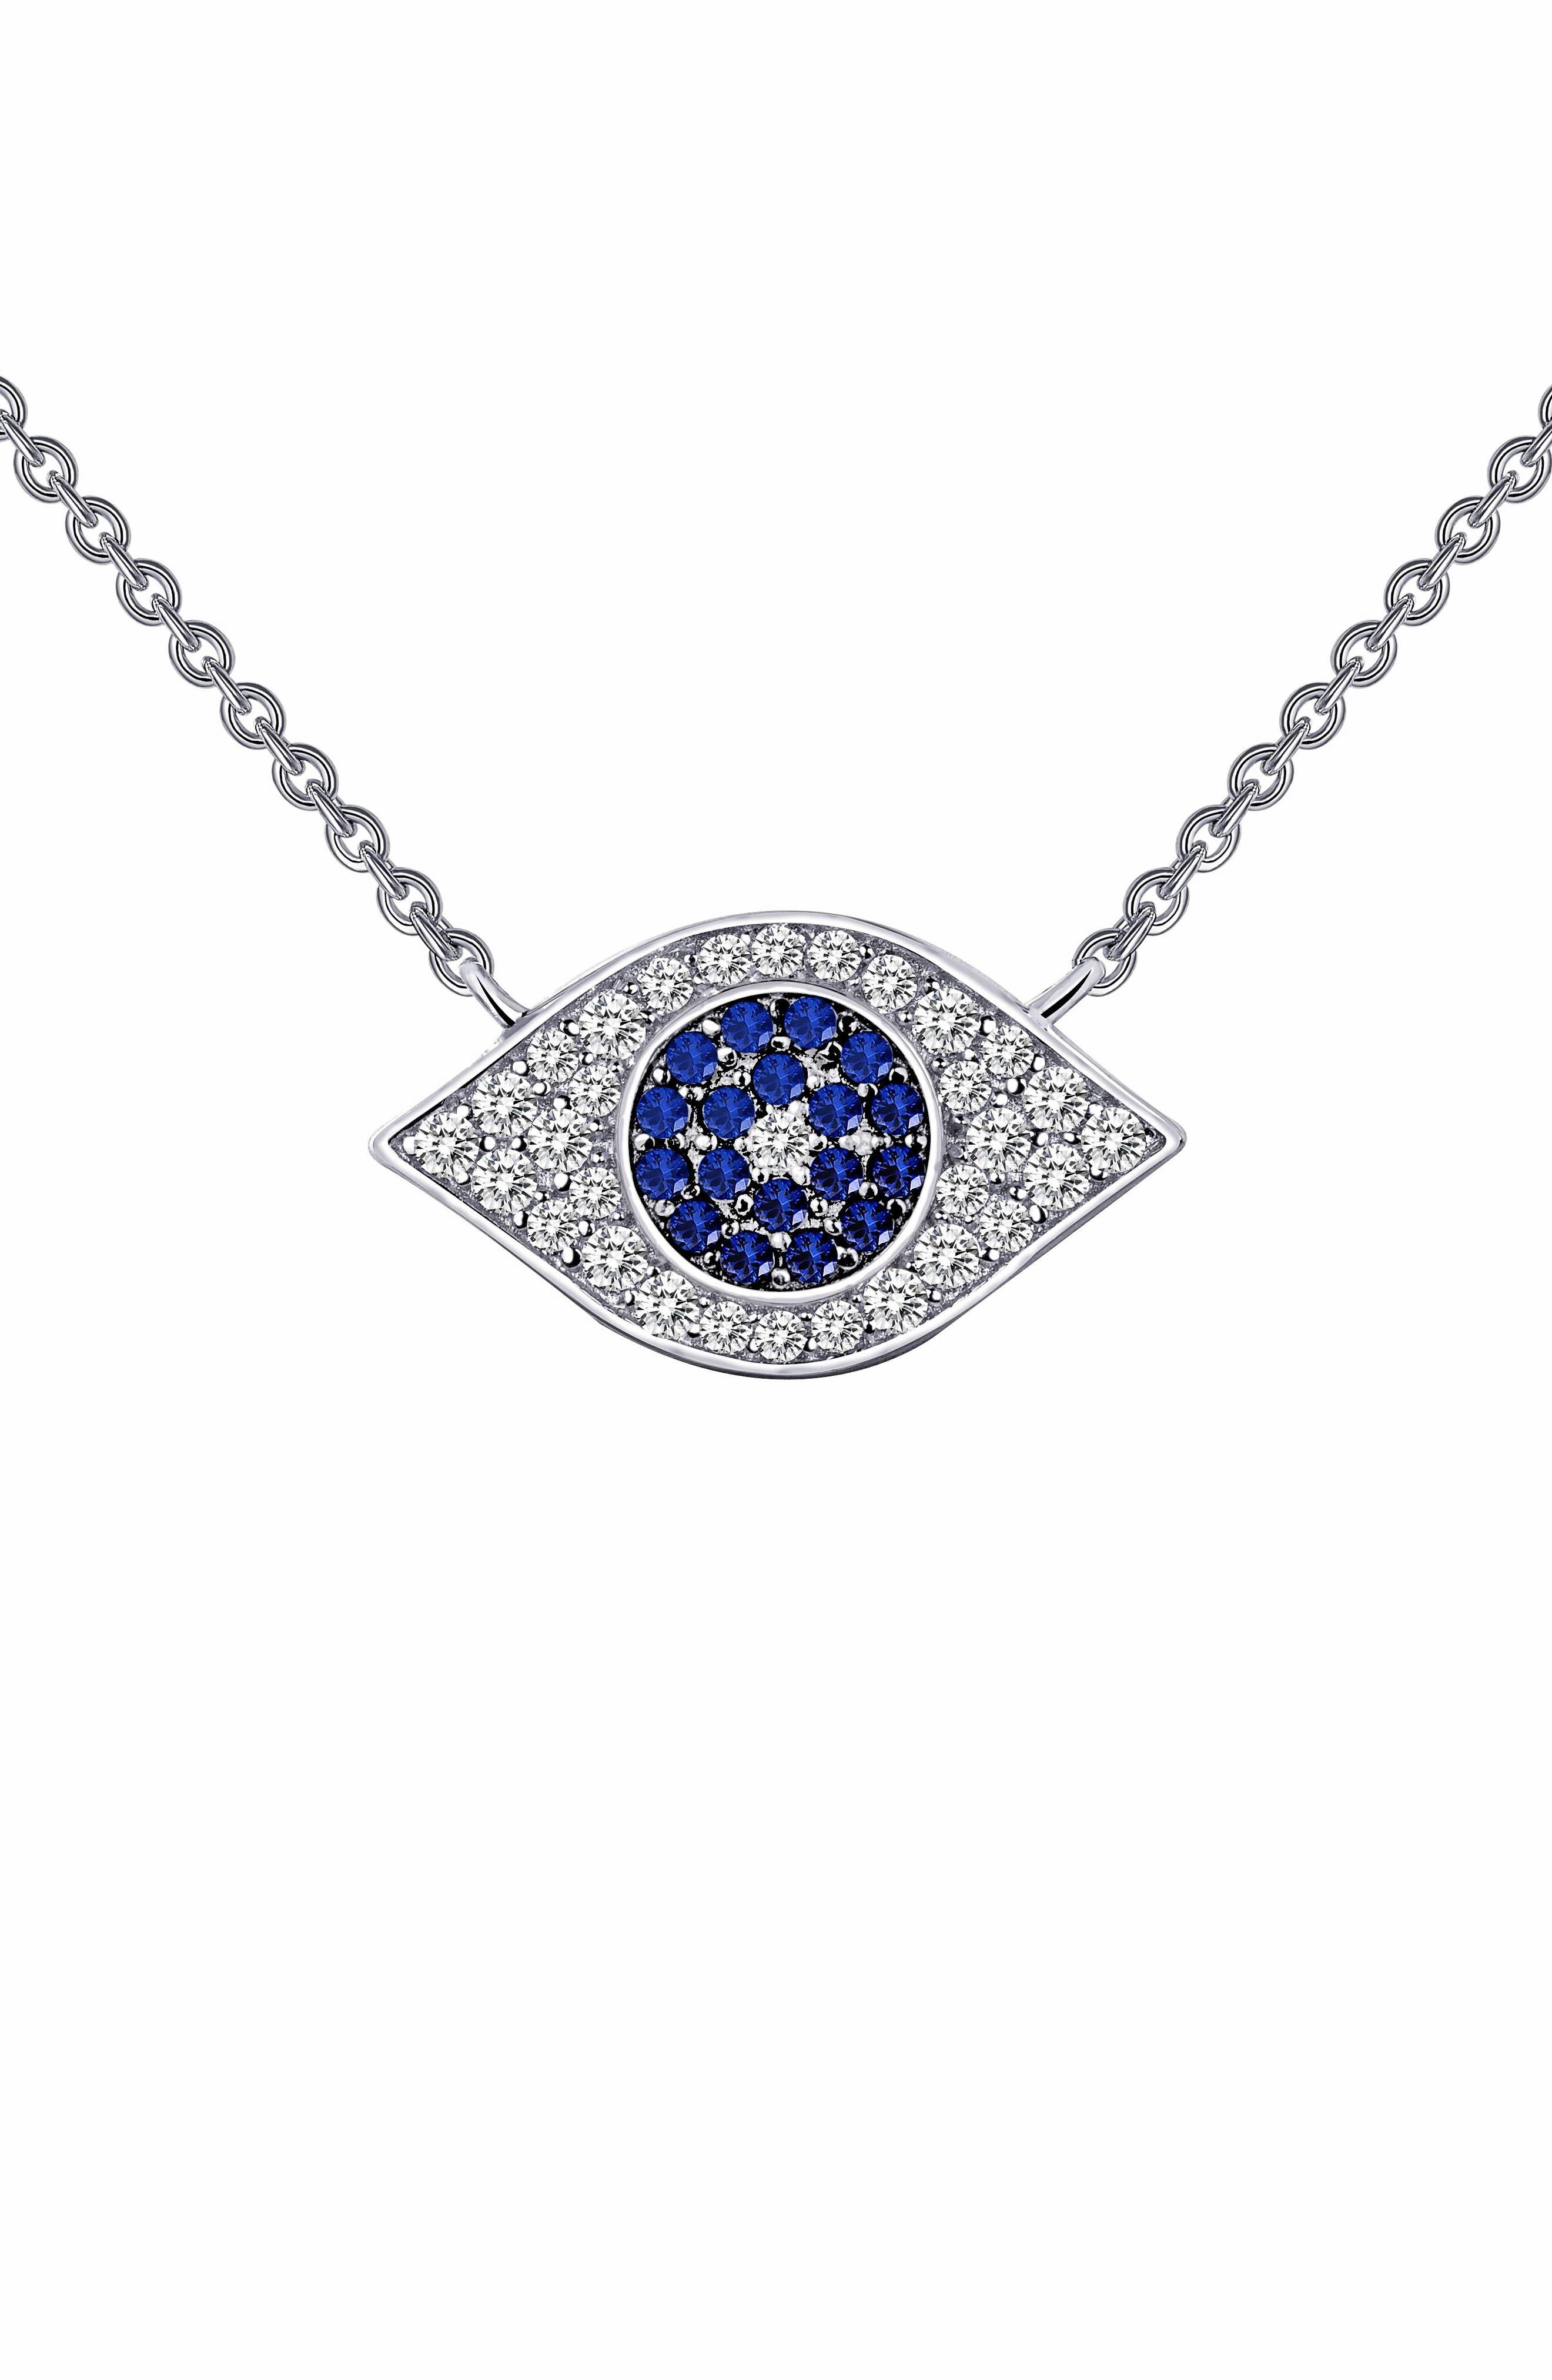 Simulated Diamond Amulet Pendant Necklace